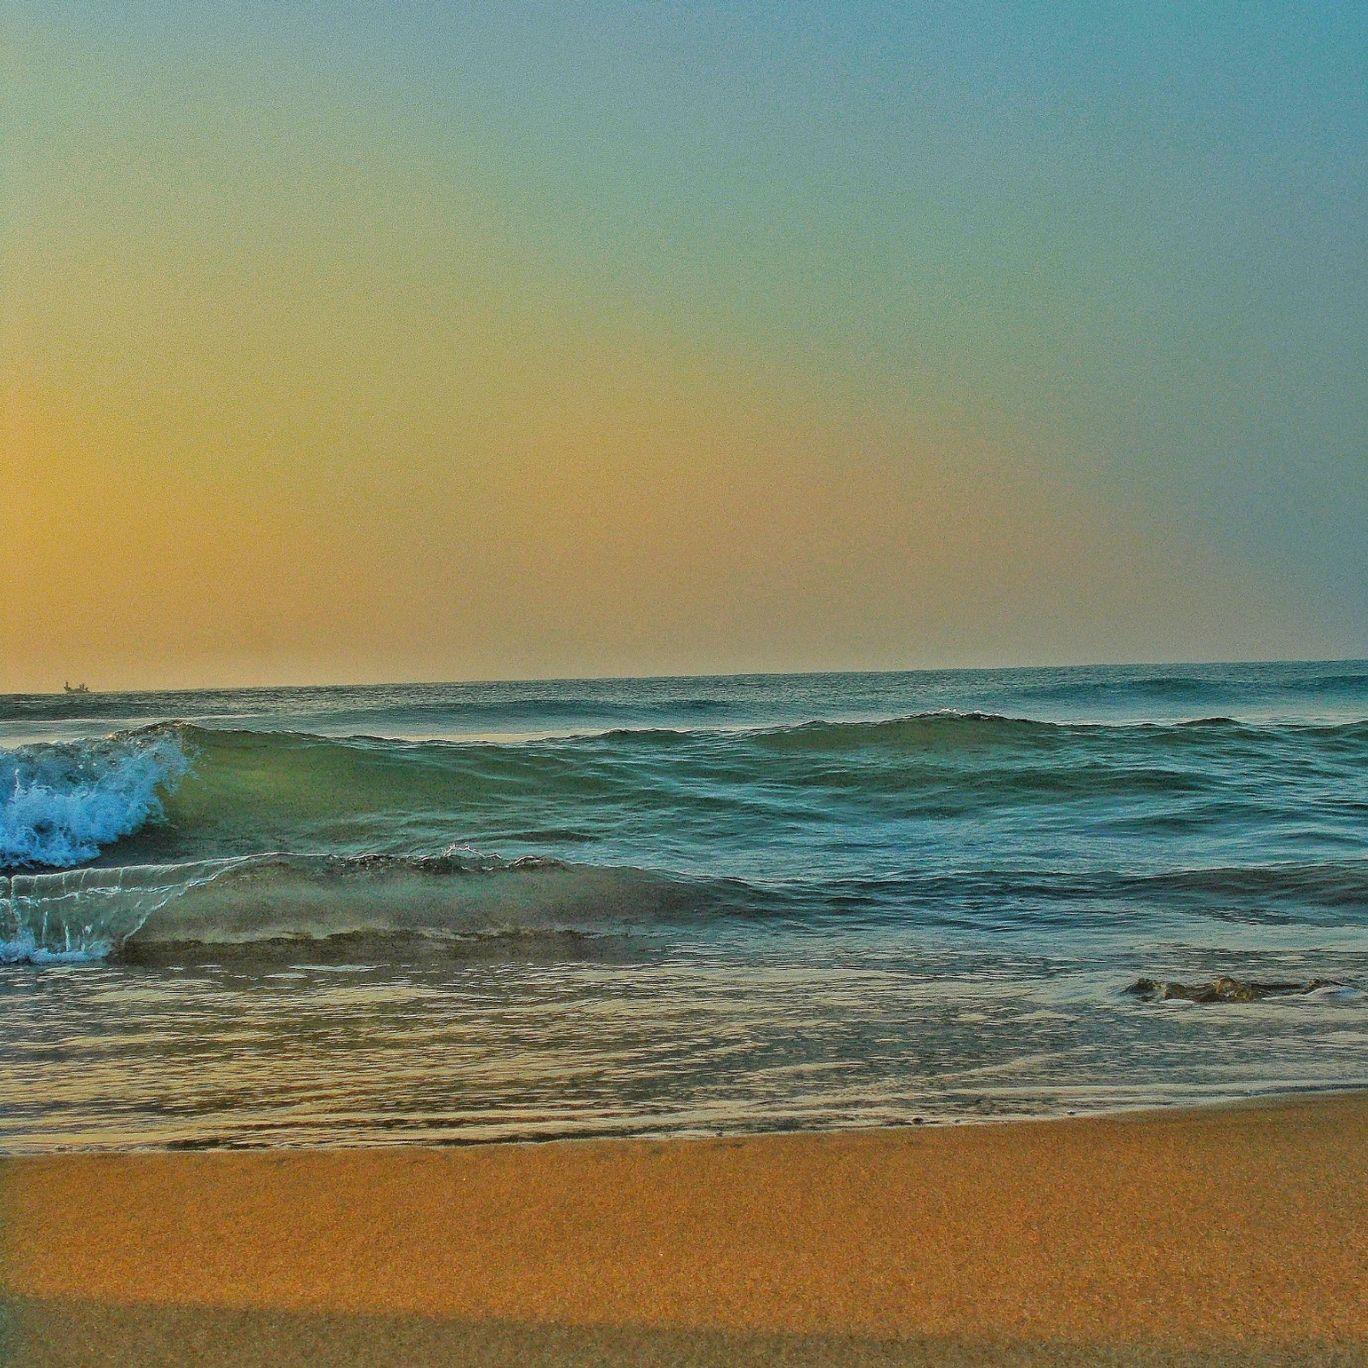 Photo of Puri sea beach By Gaurav Sahu